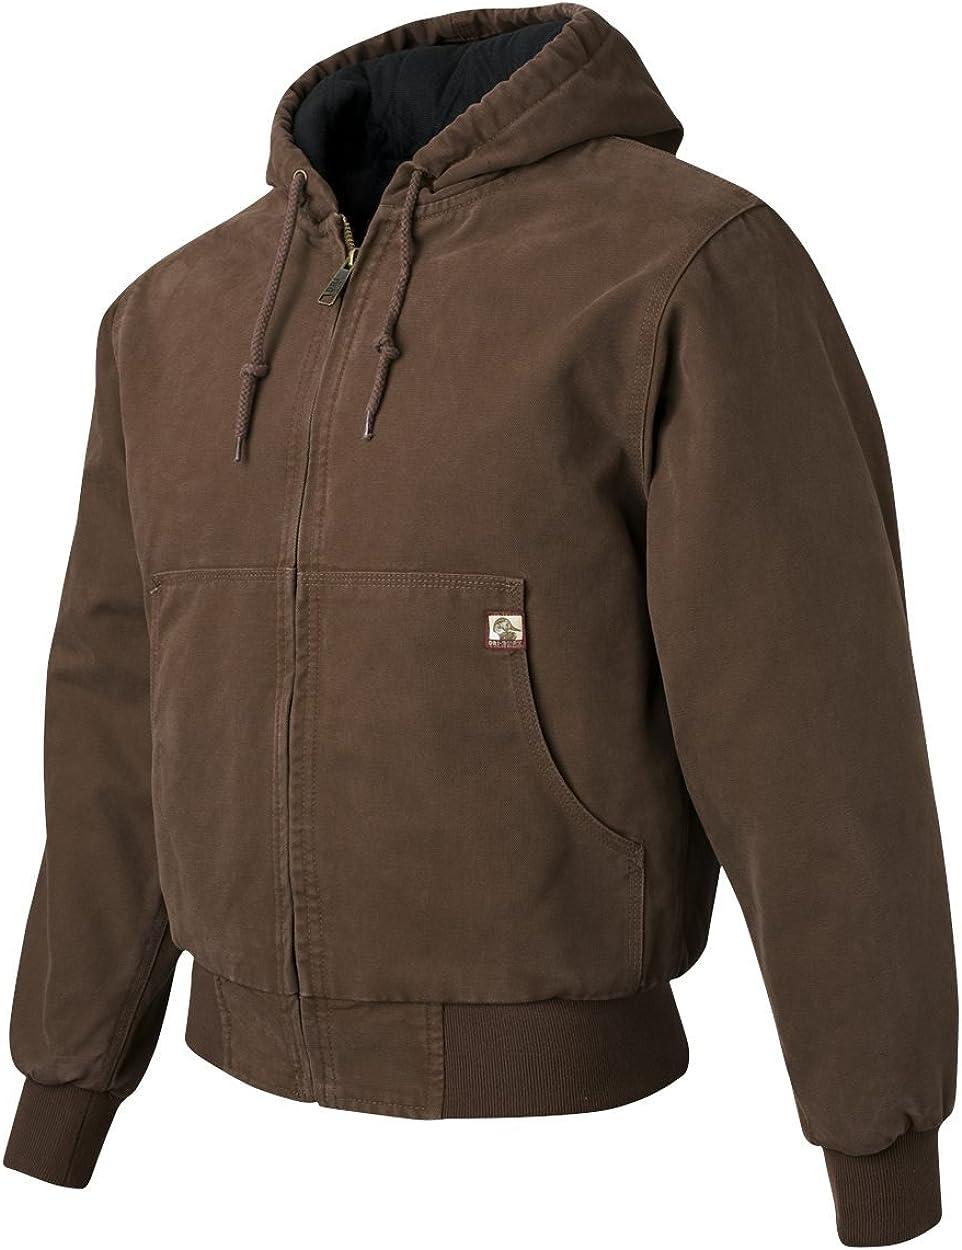 DRI Duck Men's 5020 / 5020T Cheyenne Hooded Boulder Cloth Zip Up Work Wear Jacket with Tricot Quilt Lining